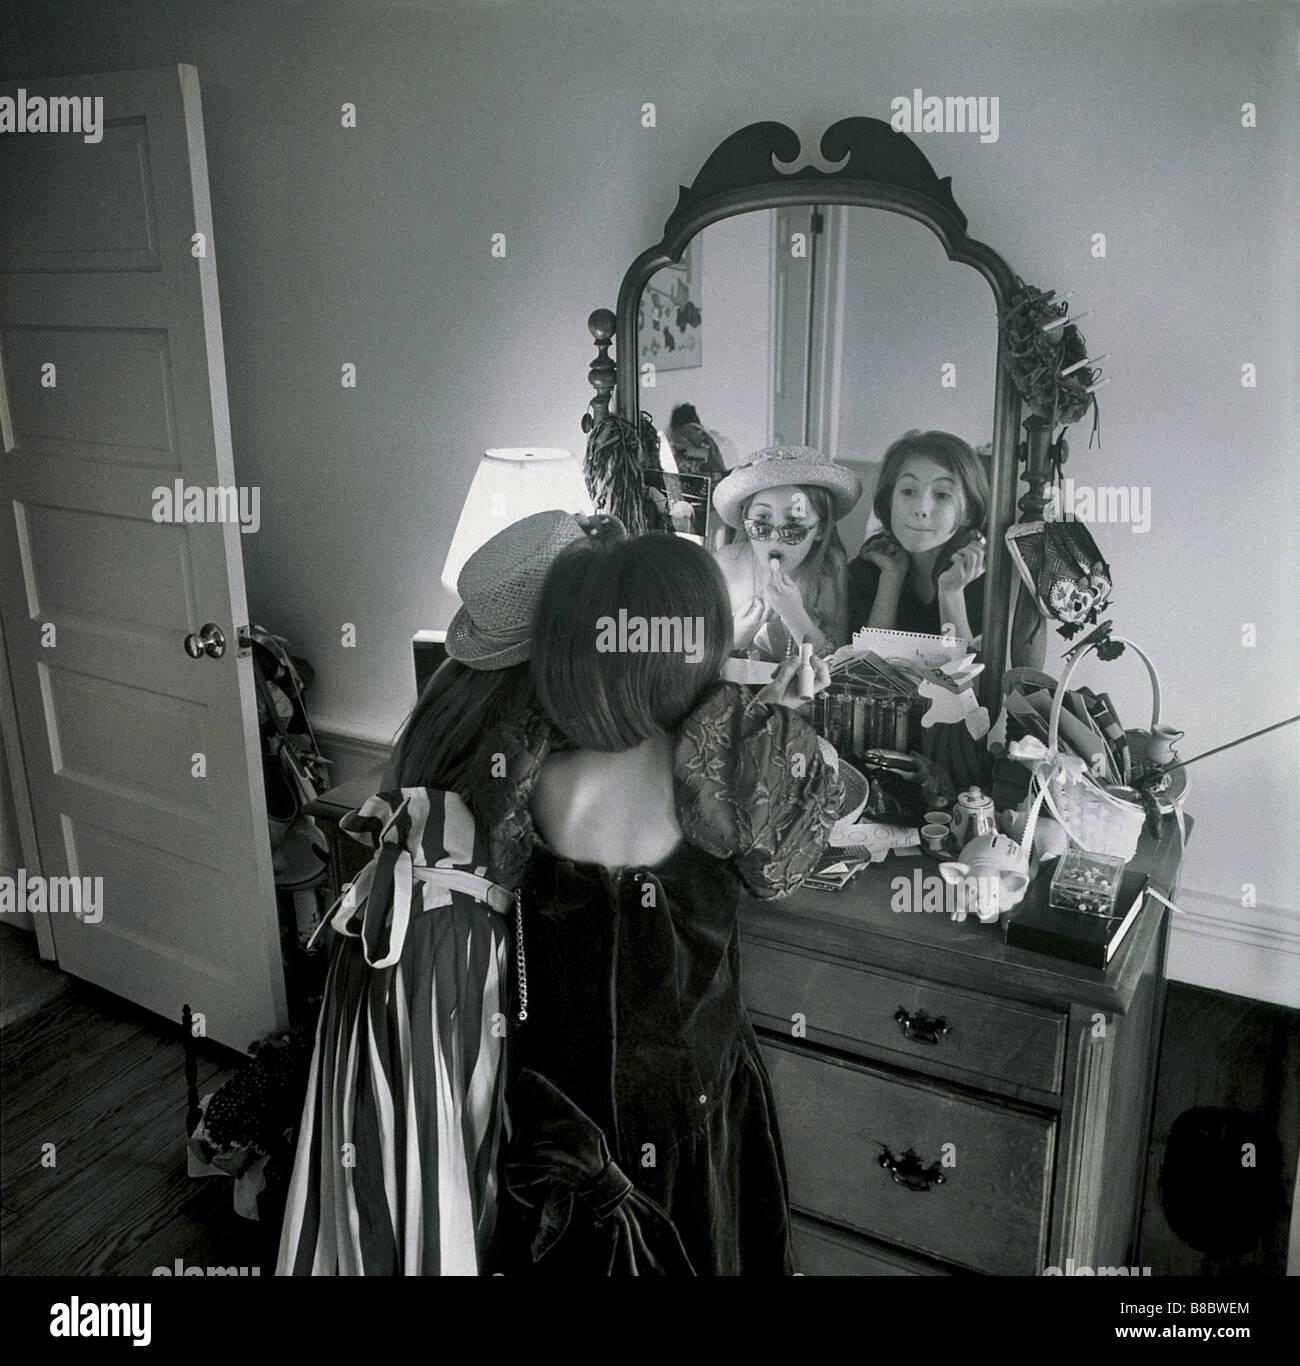 FL4881, Nick Kelsh; dos niñas jugando vestirse espejo, BW Imagen De Stock